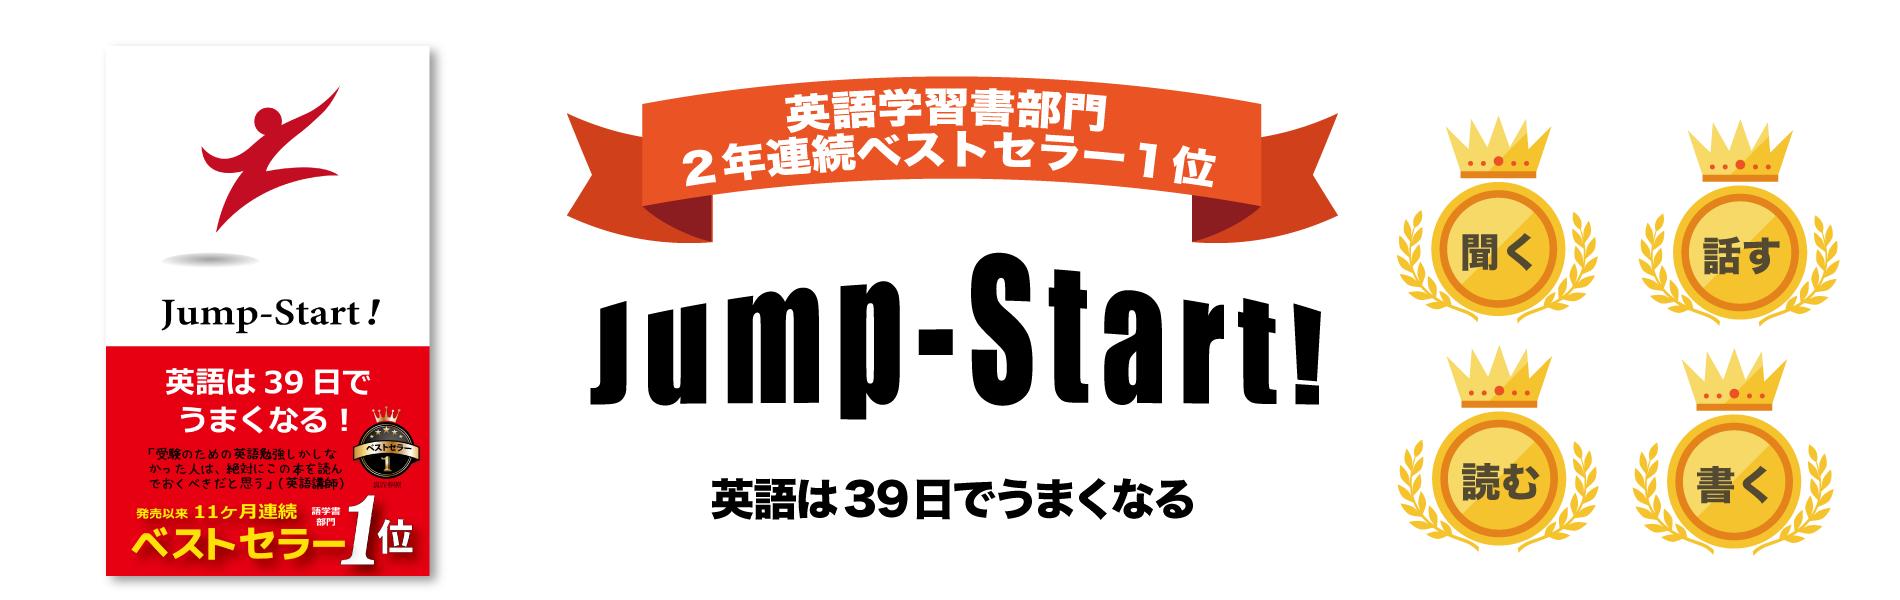 Jump-Start!の紹介画像